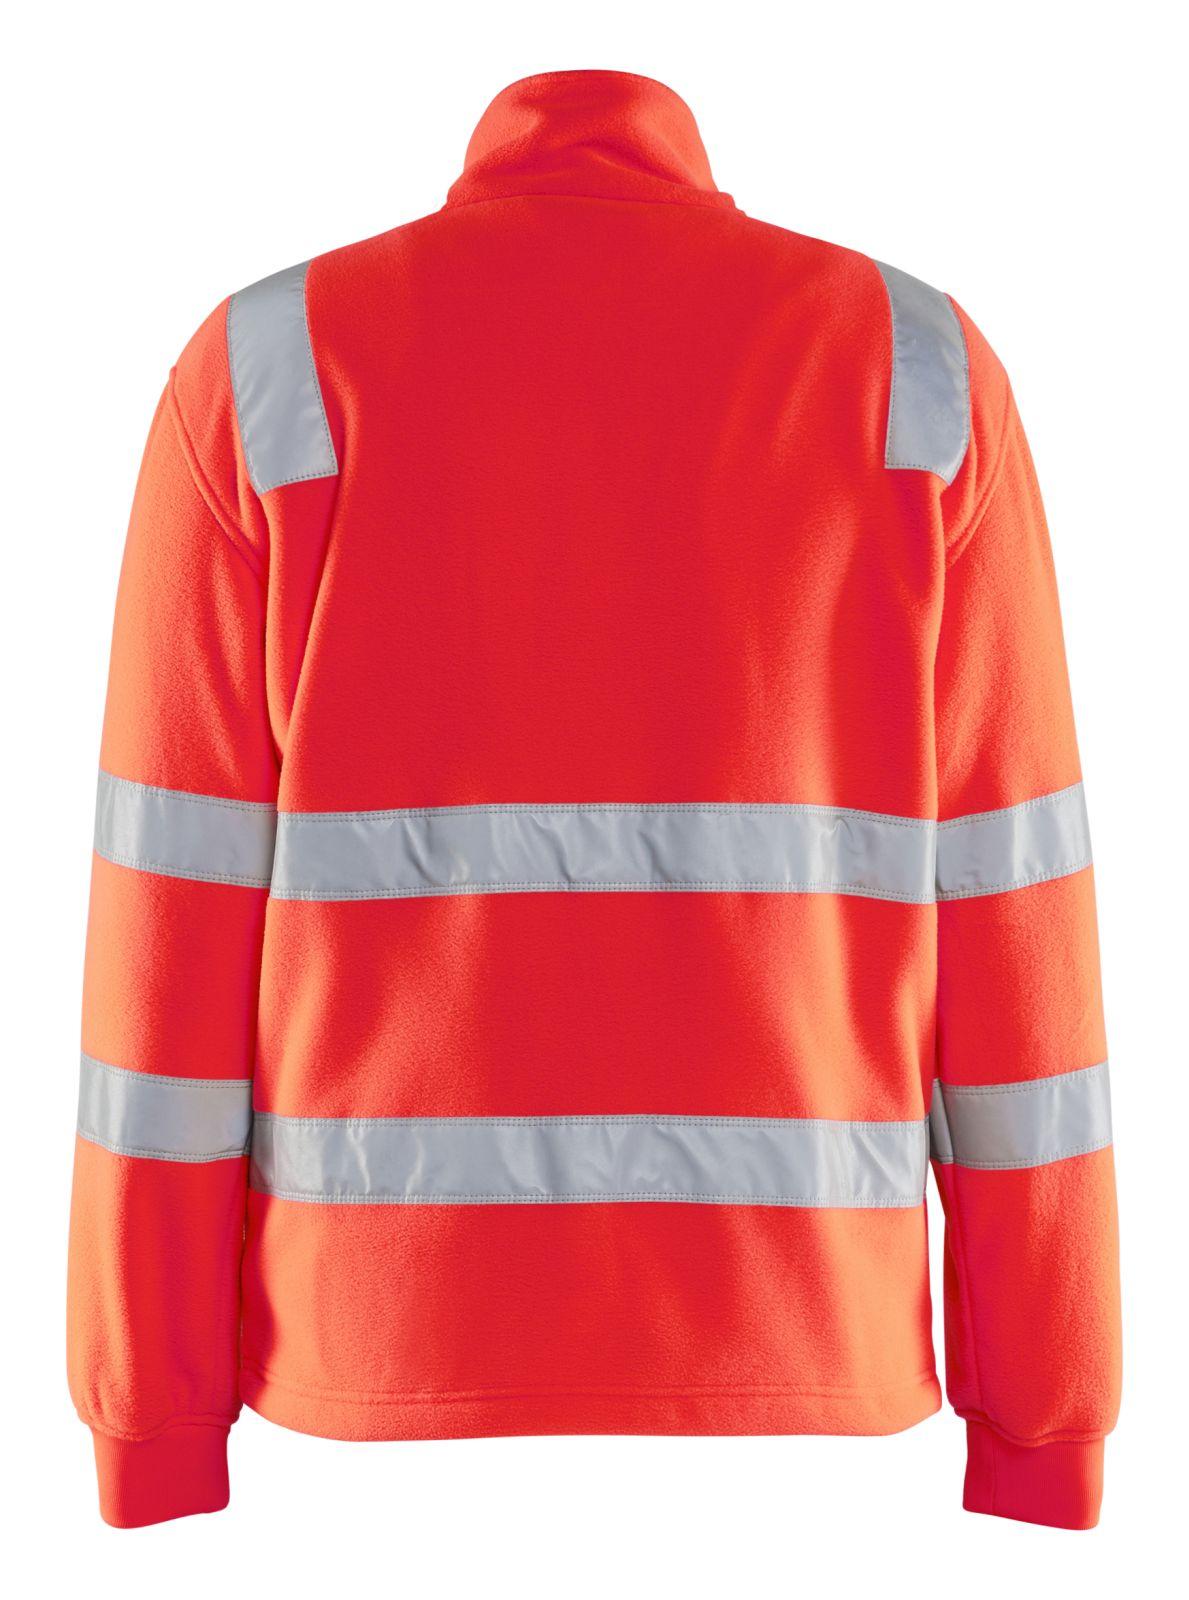 Blaklader Fleece vesten 48332560 High Vis fluor rood(5500)